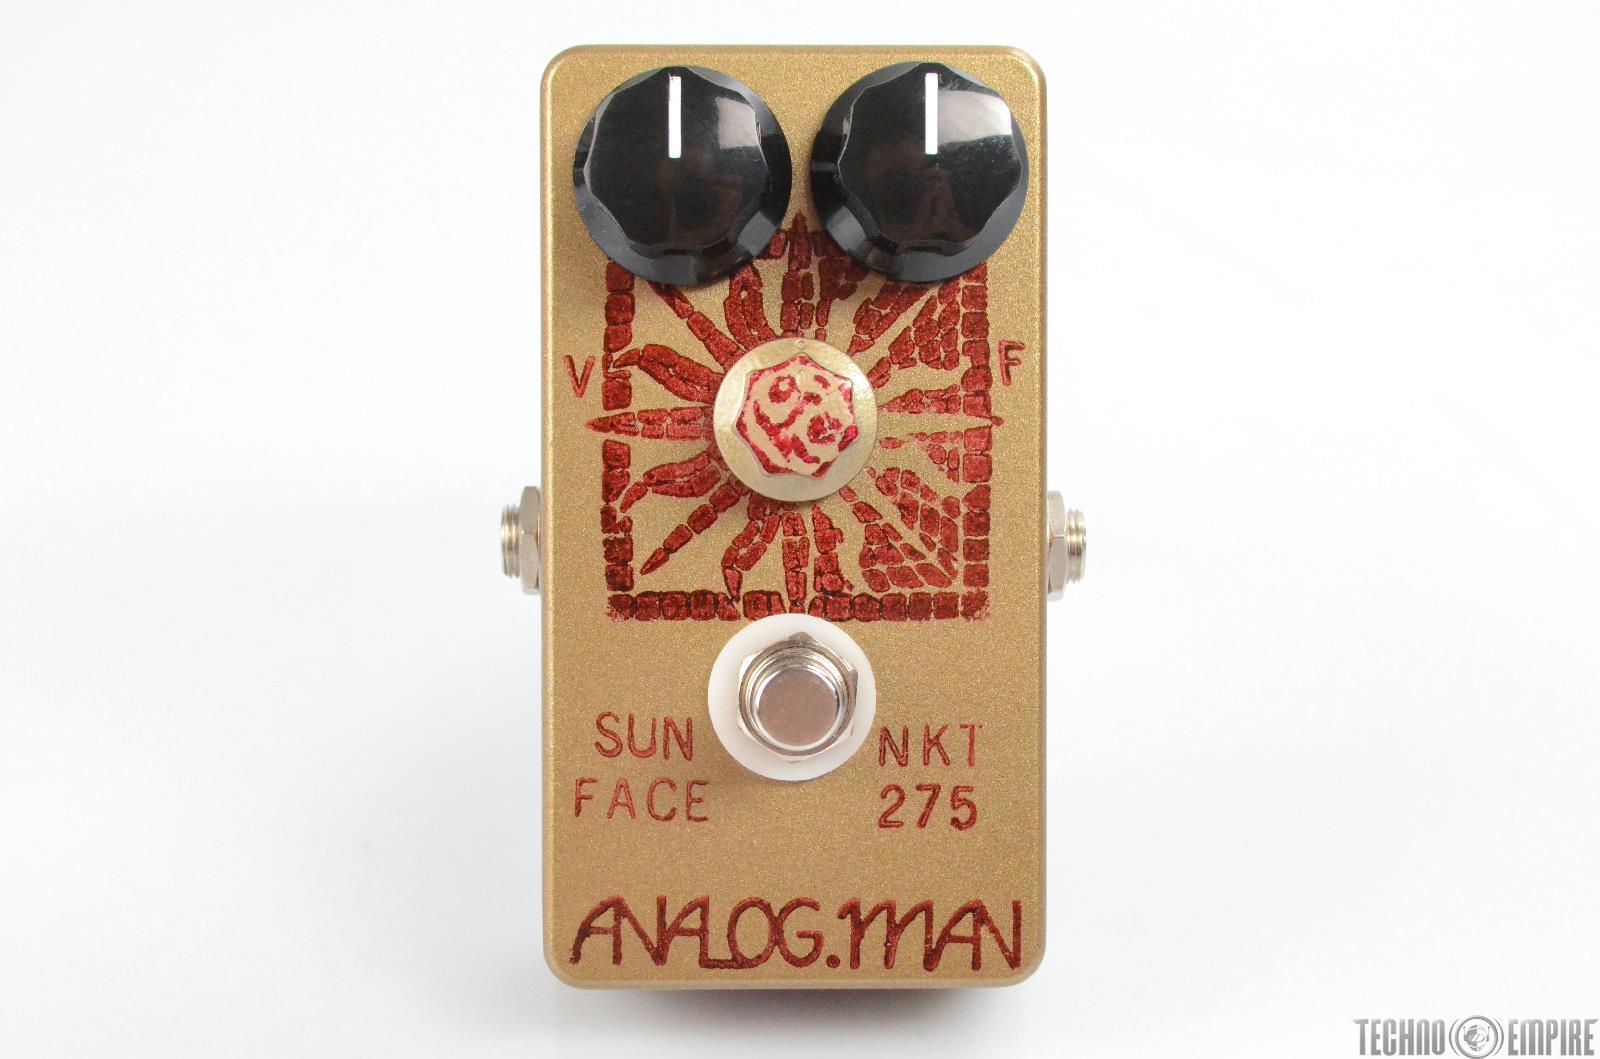 Analog Man Sun Face Red Dot NKT 275 Transistor Fuzz Effect Pedal w/ Box #30414